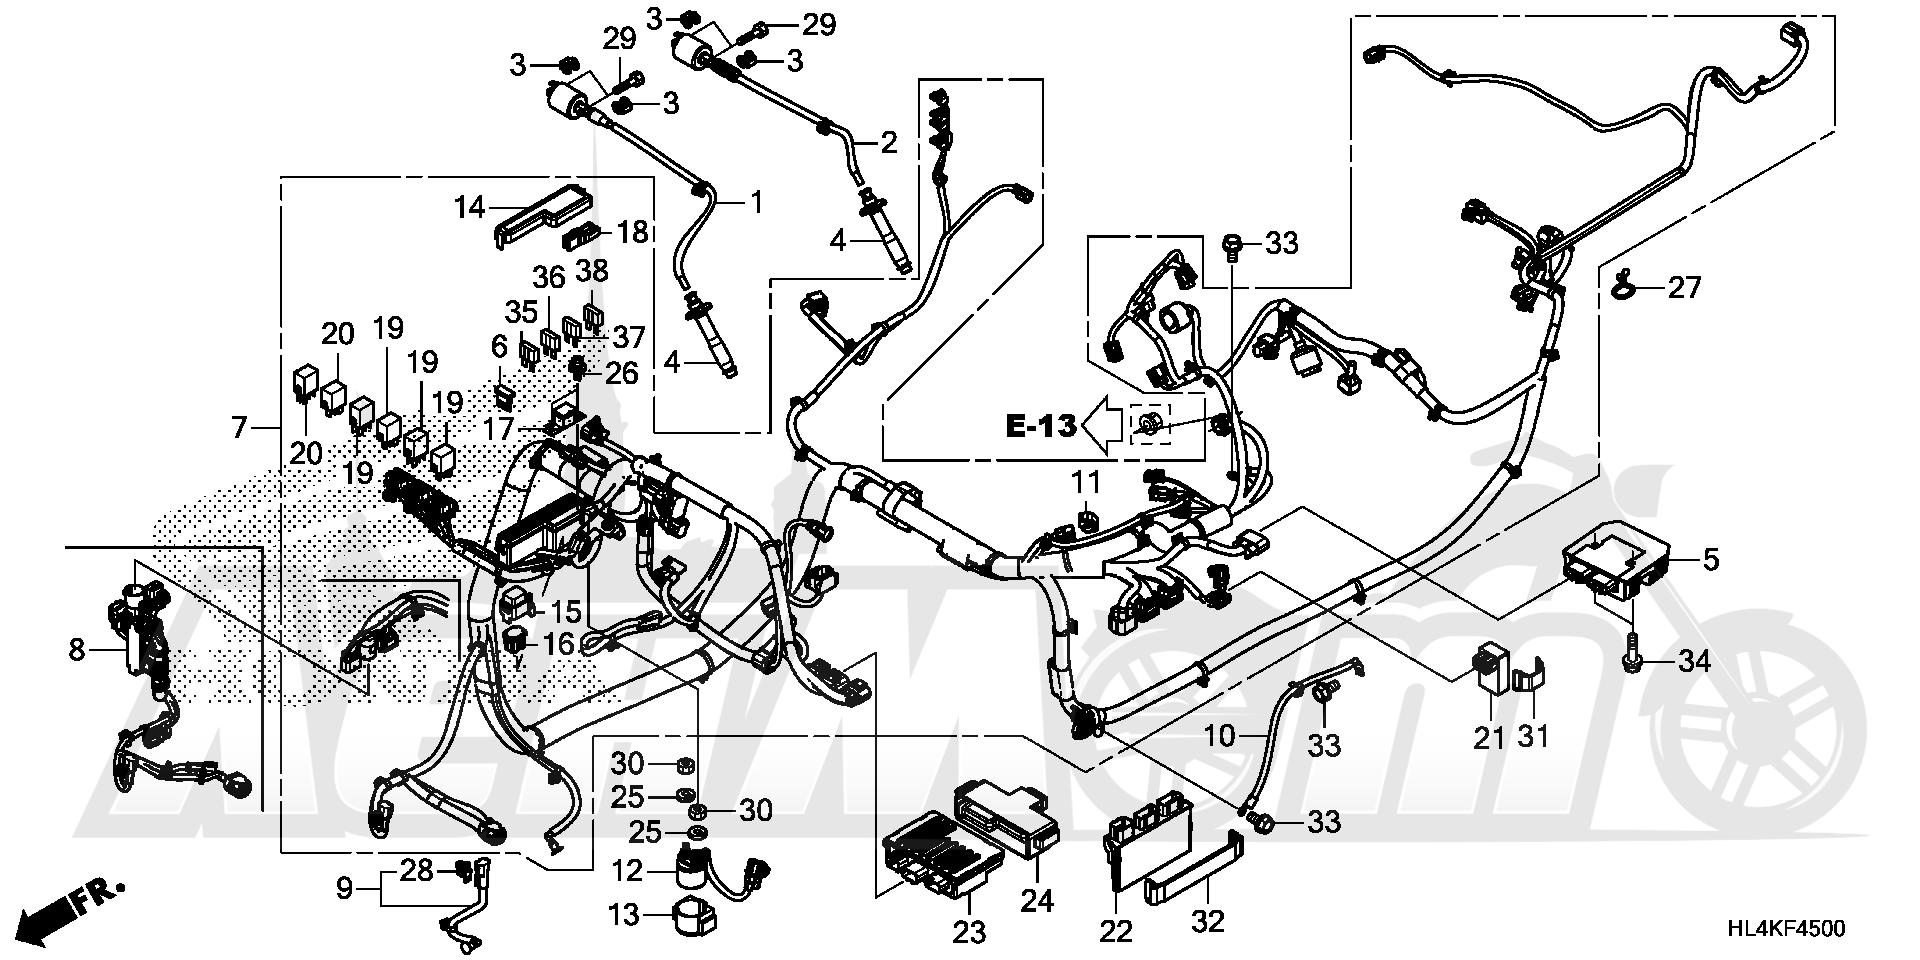 Запчасти для Квадроцикла Honda 2019 SXS1000M5P Раздел: WIRE HARNESS | жгут проводов